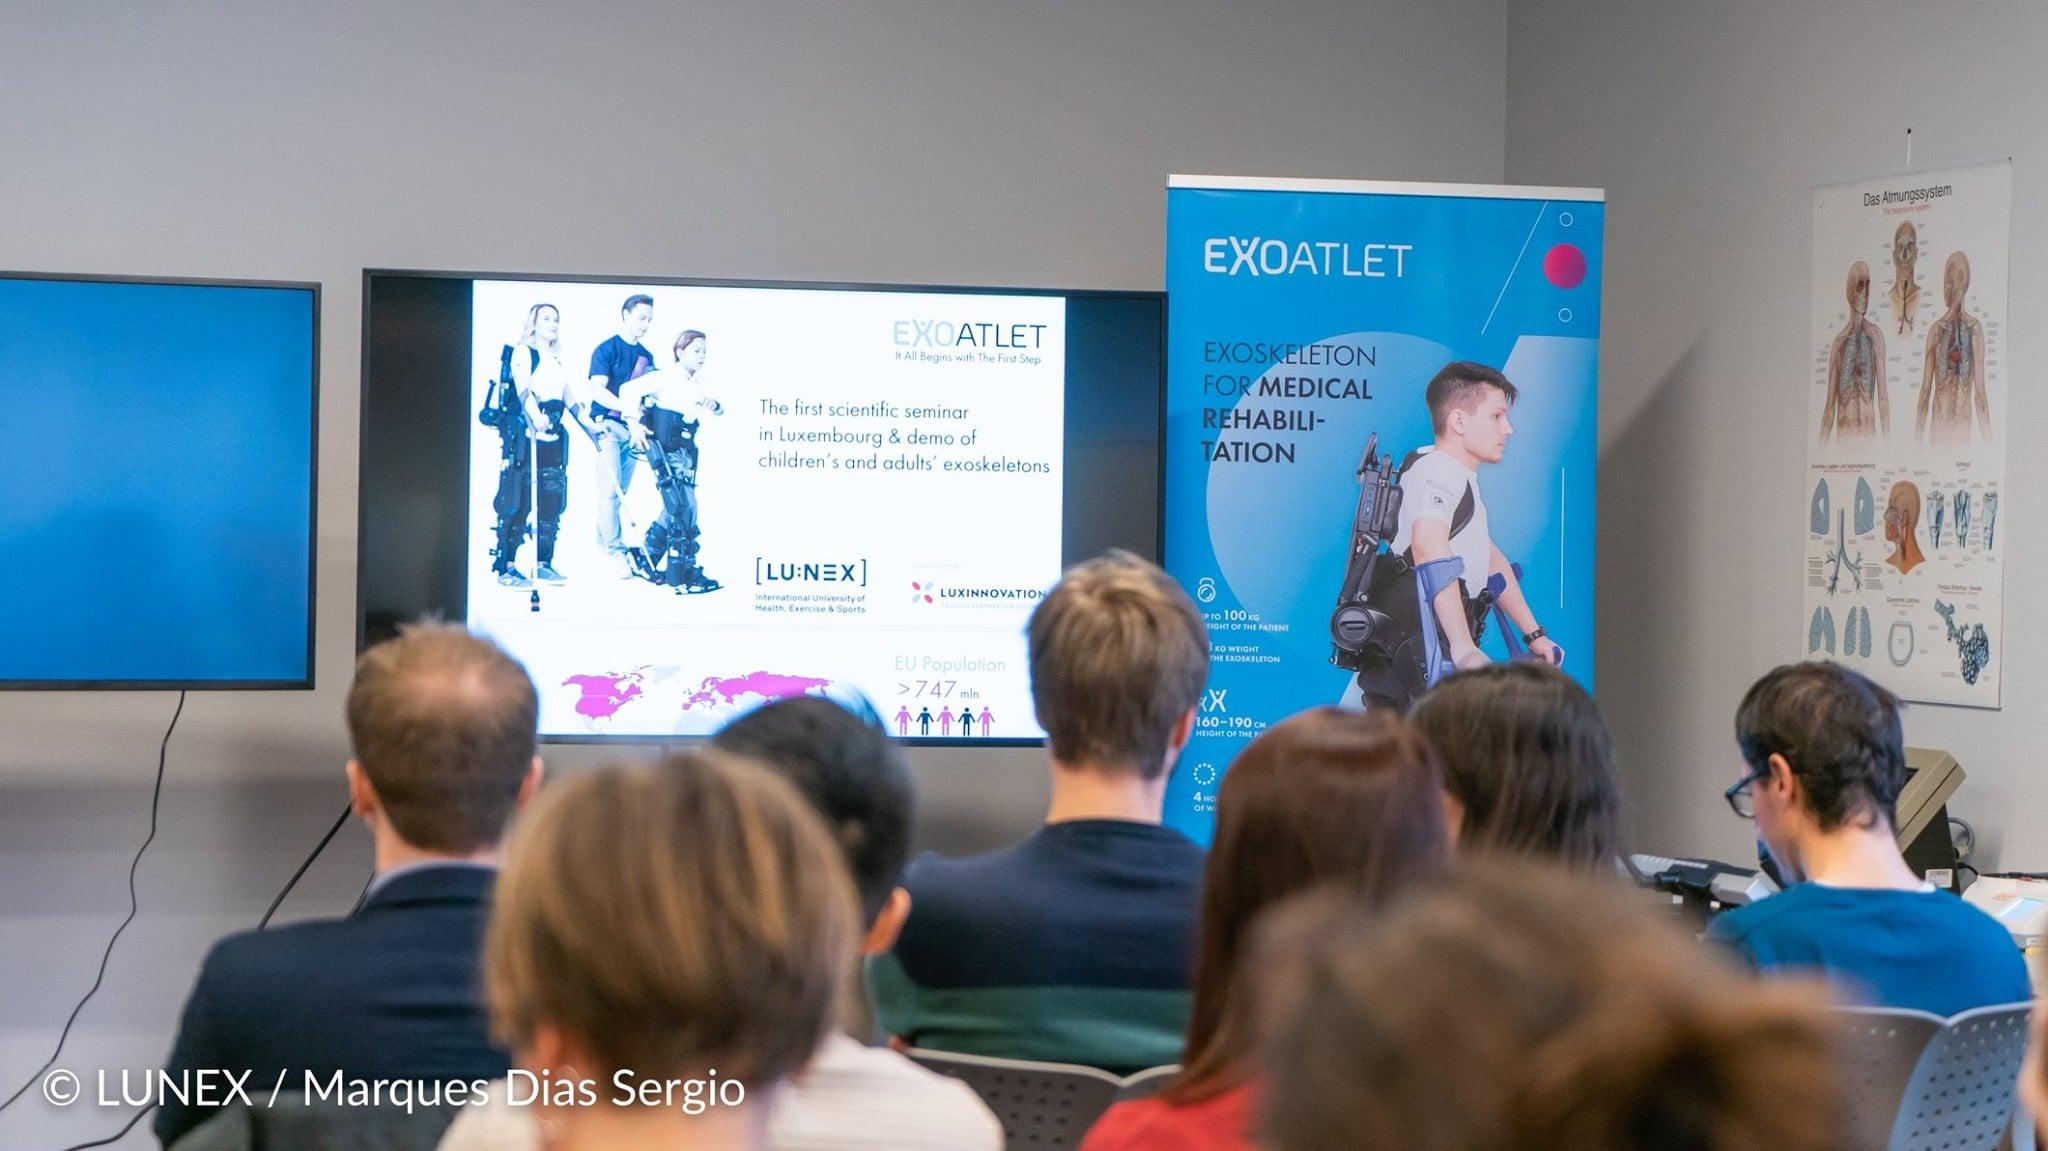 Presentation of the ExoAtlet Workshop organized at LUNEX University